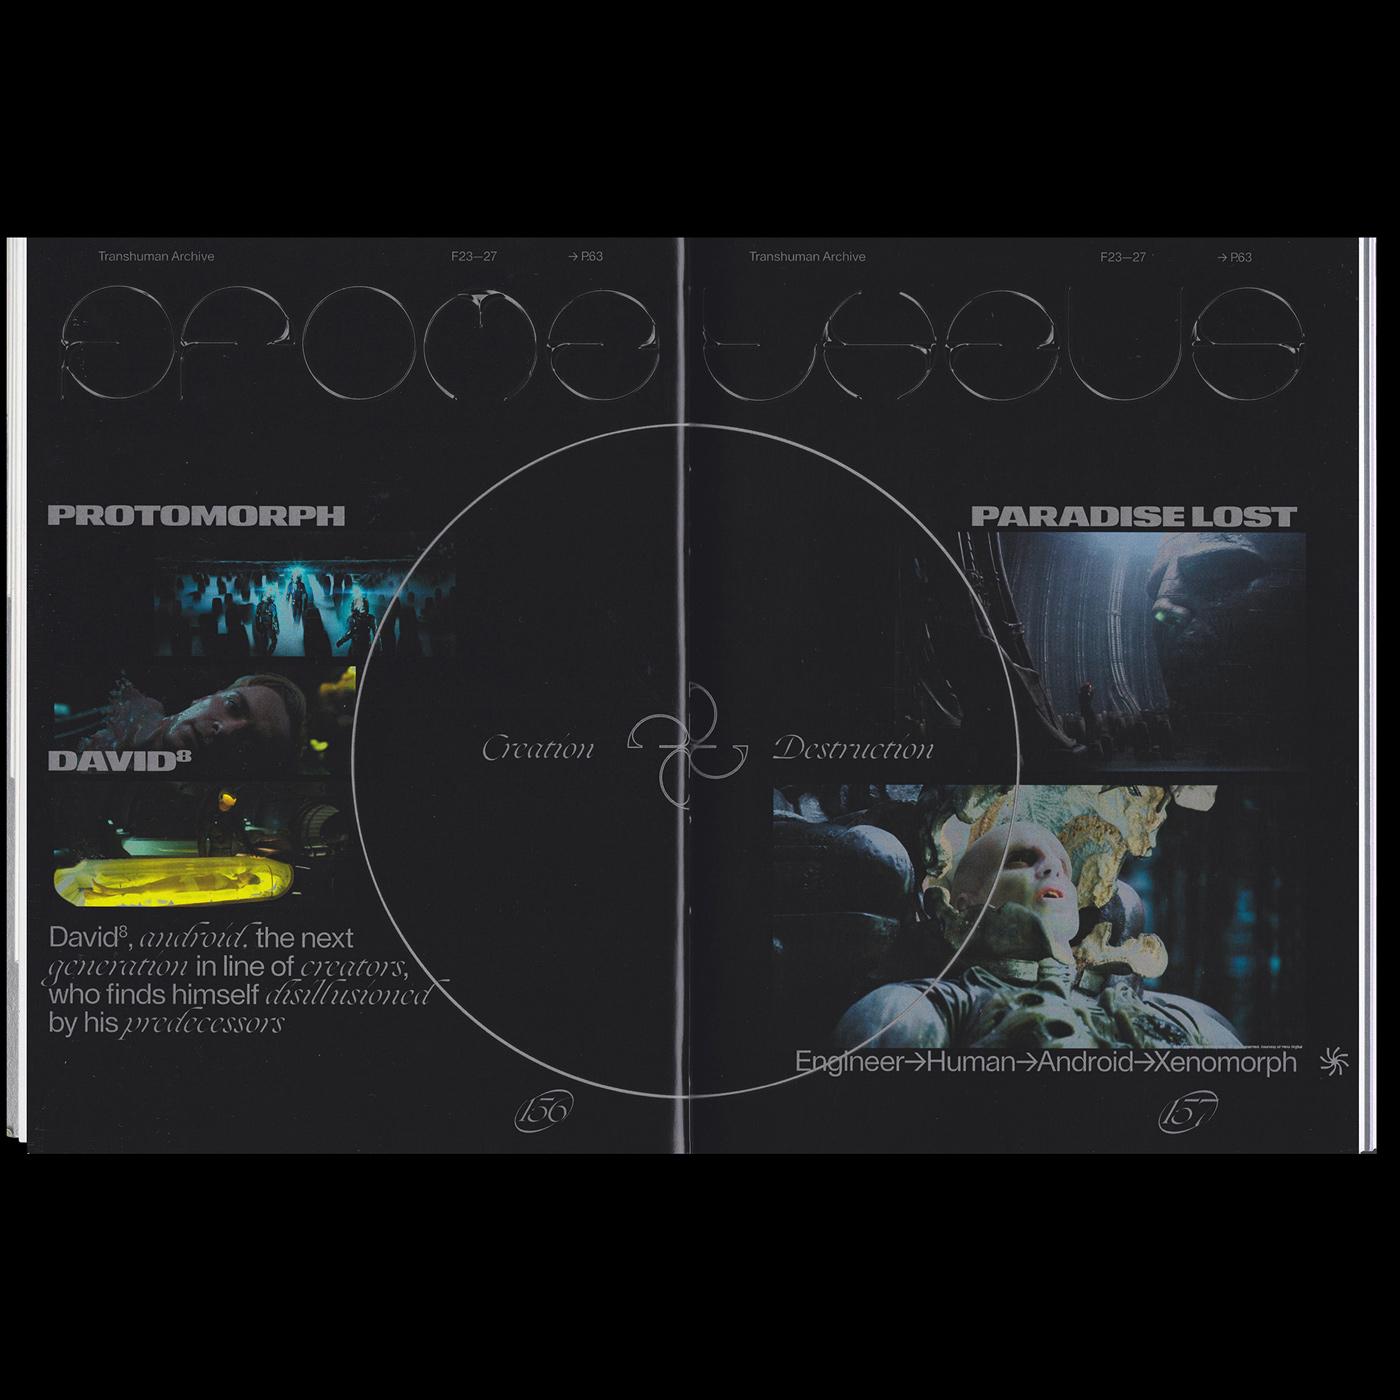 07 collide24 Transhuman Archive Stella Klump Leonie Krein Moritz Büsselberg - The book 'Transhuman Archive' by Stella Klump, Leonie Krein and Moritz Büsselberg explores the effects of transhumanism in our times